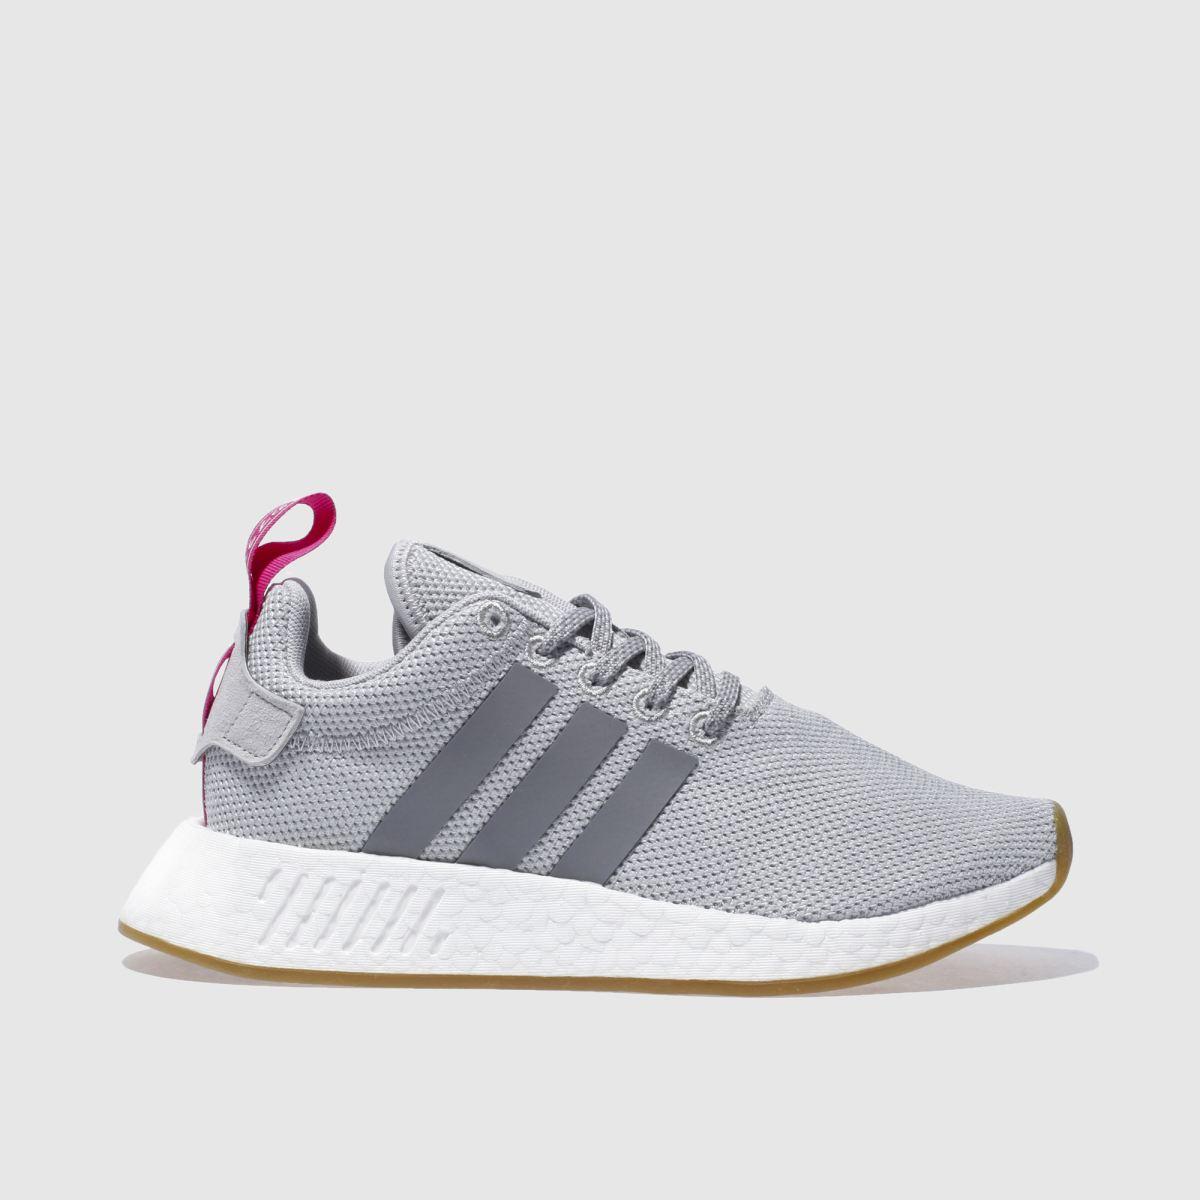 adidas light grey nmd_r2 trainers